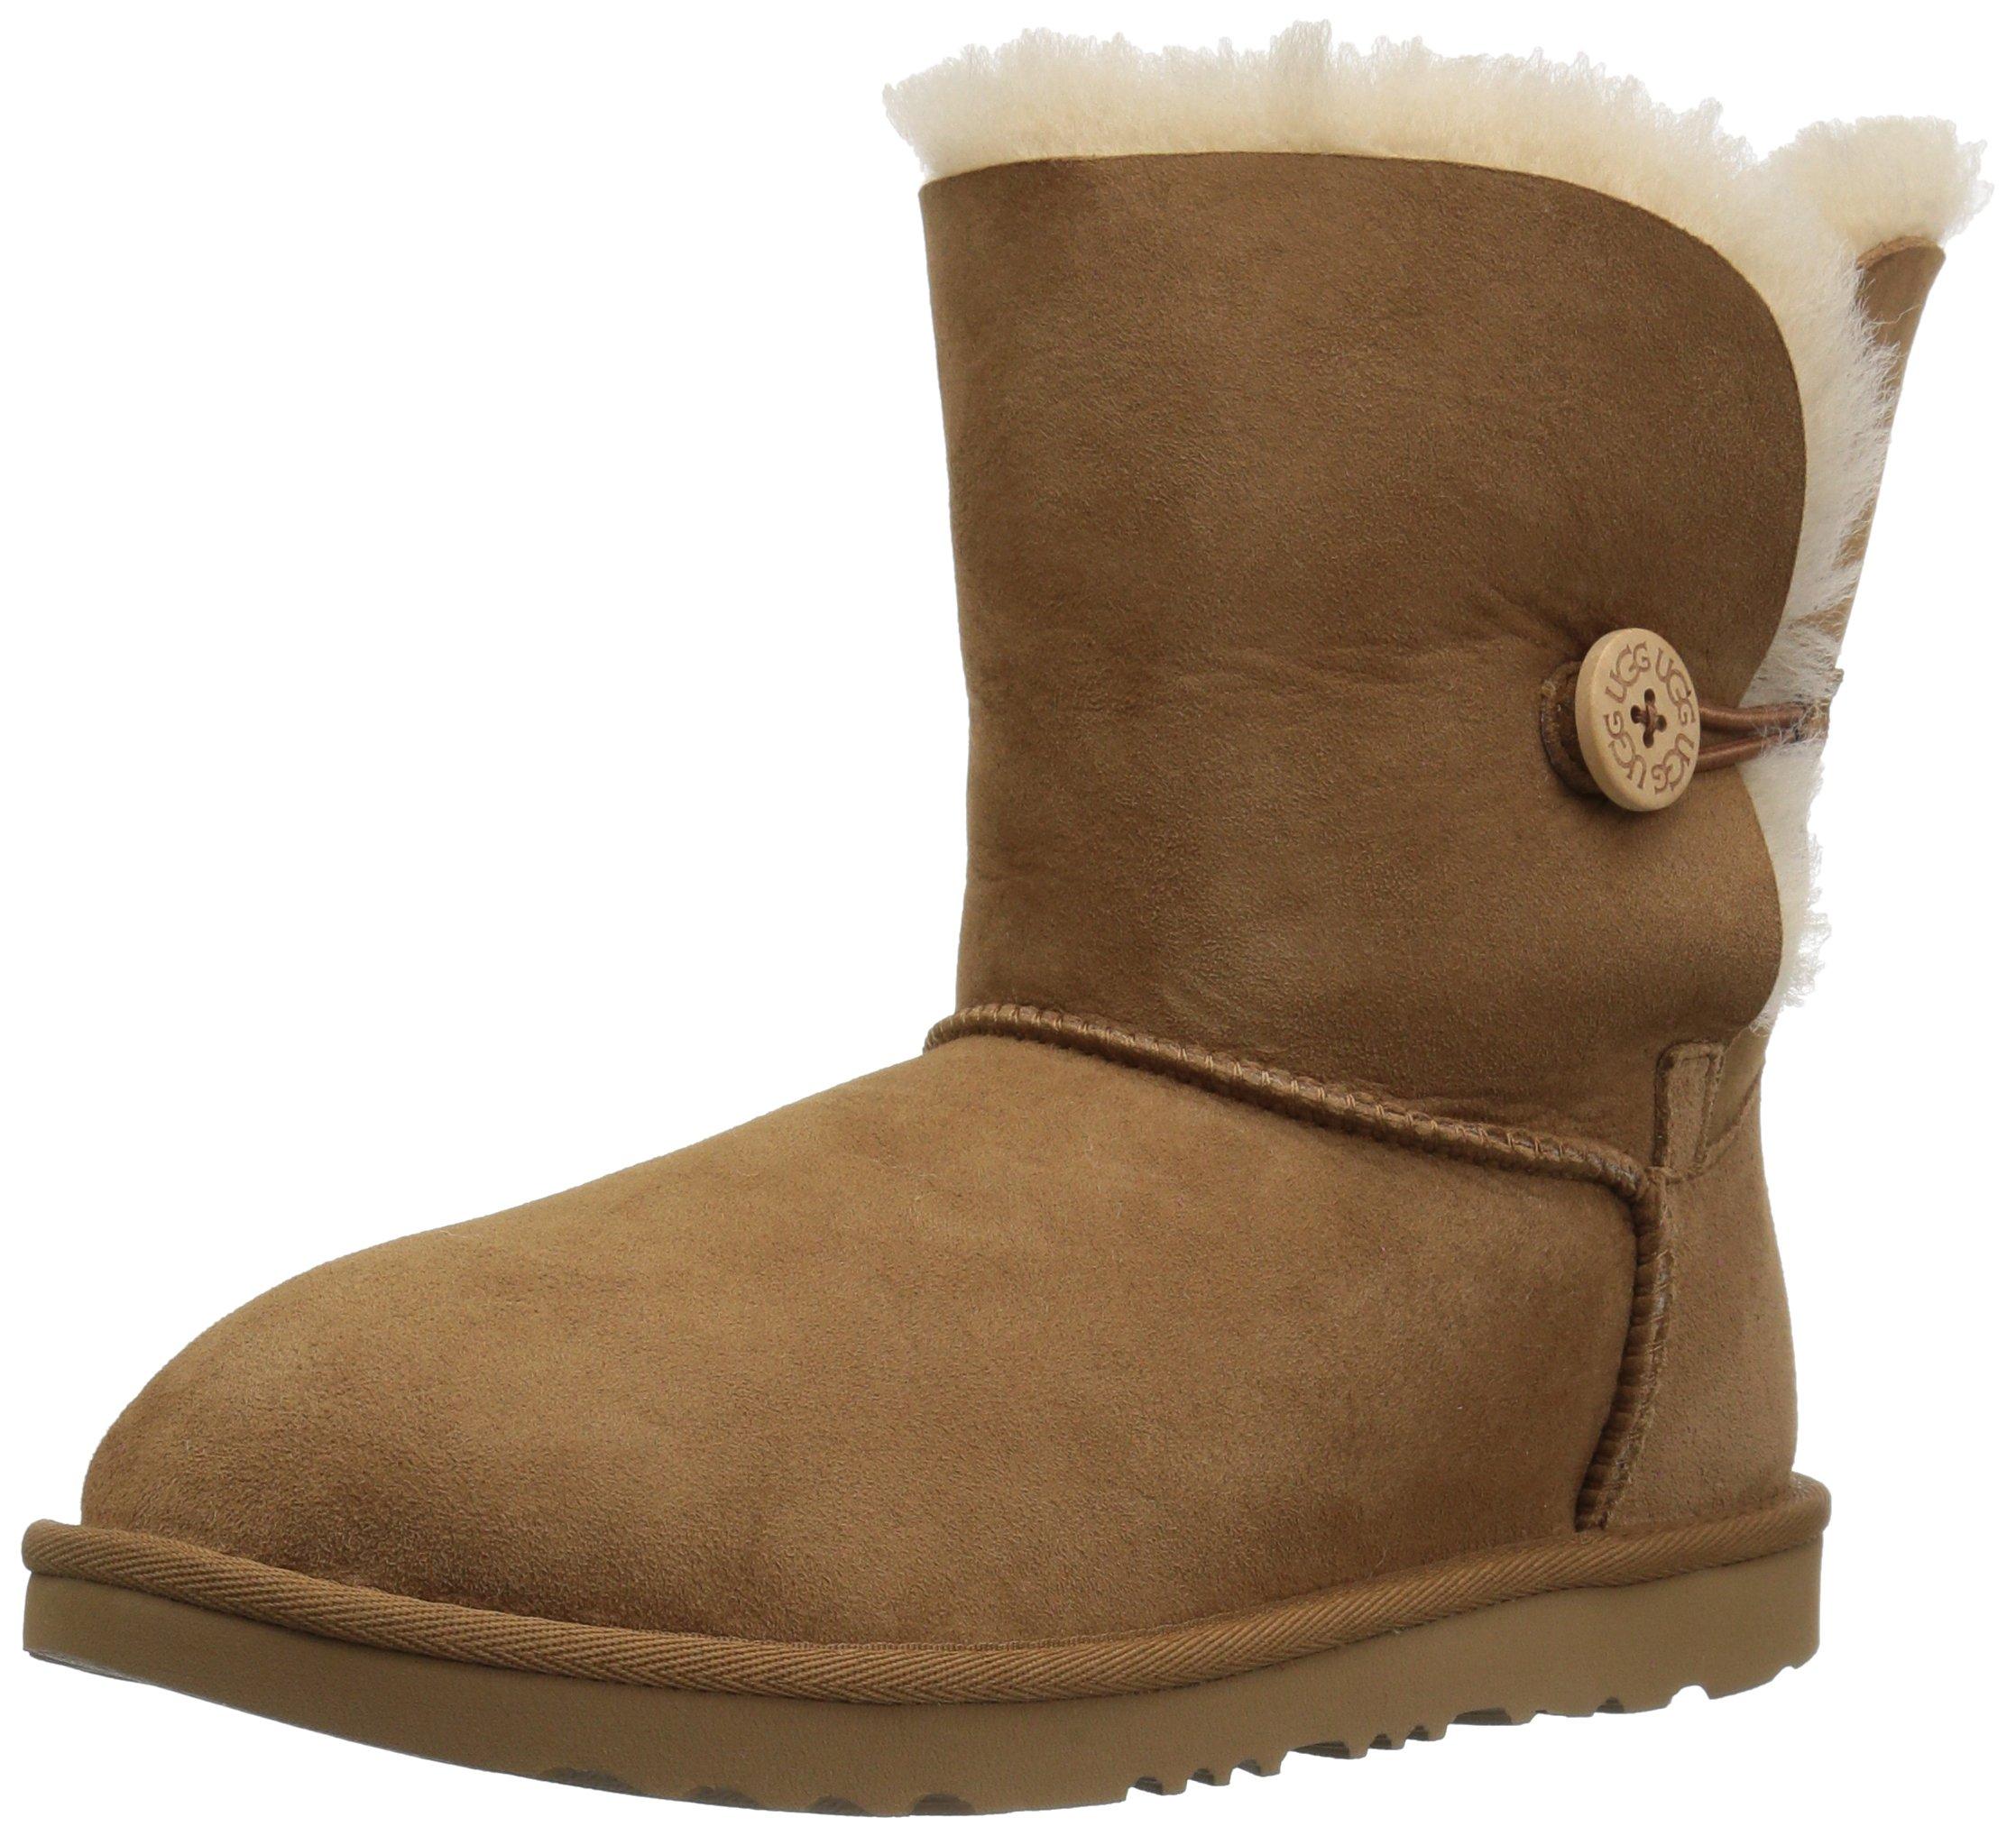 UGG Girls K Bailey Button II Fashion Boot, Chestnut, 3 M US Little Kid